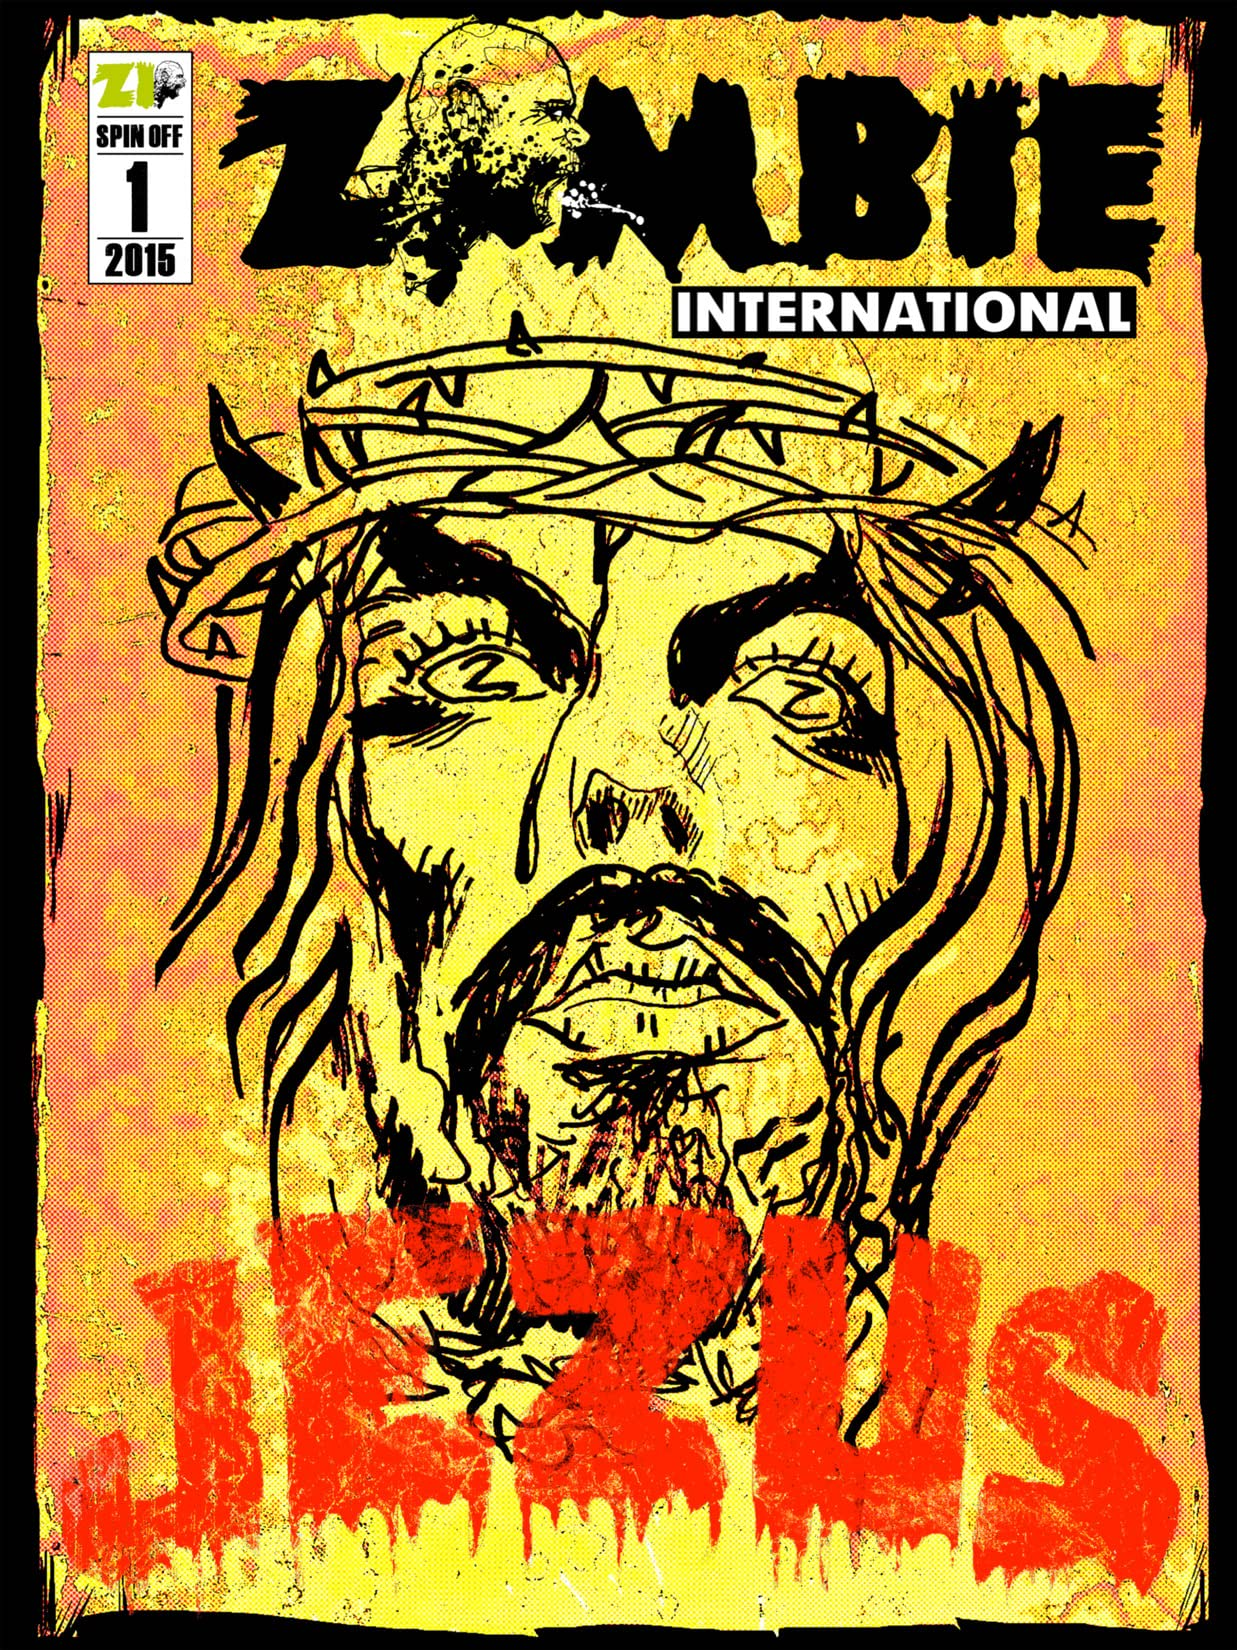 Zombie International (Spin Offs) #1